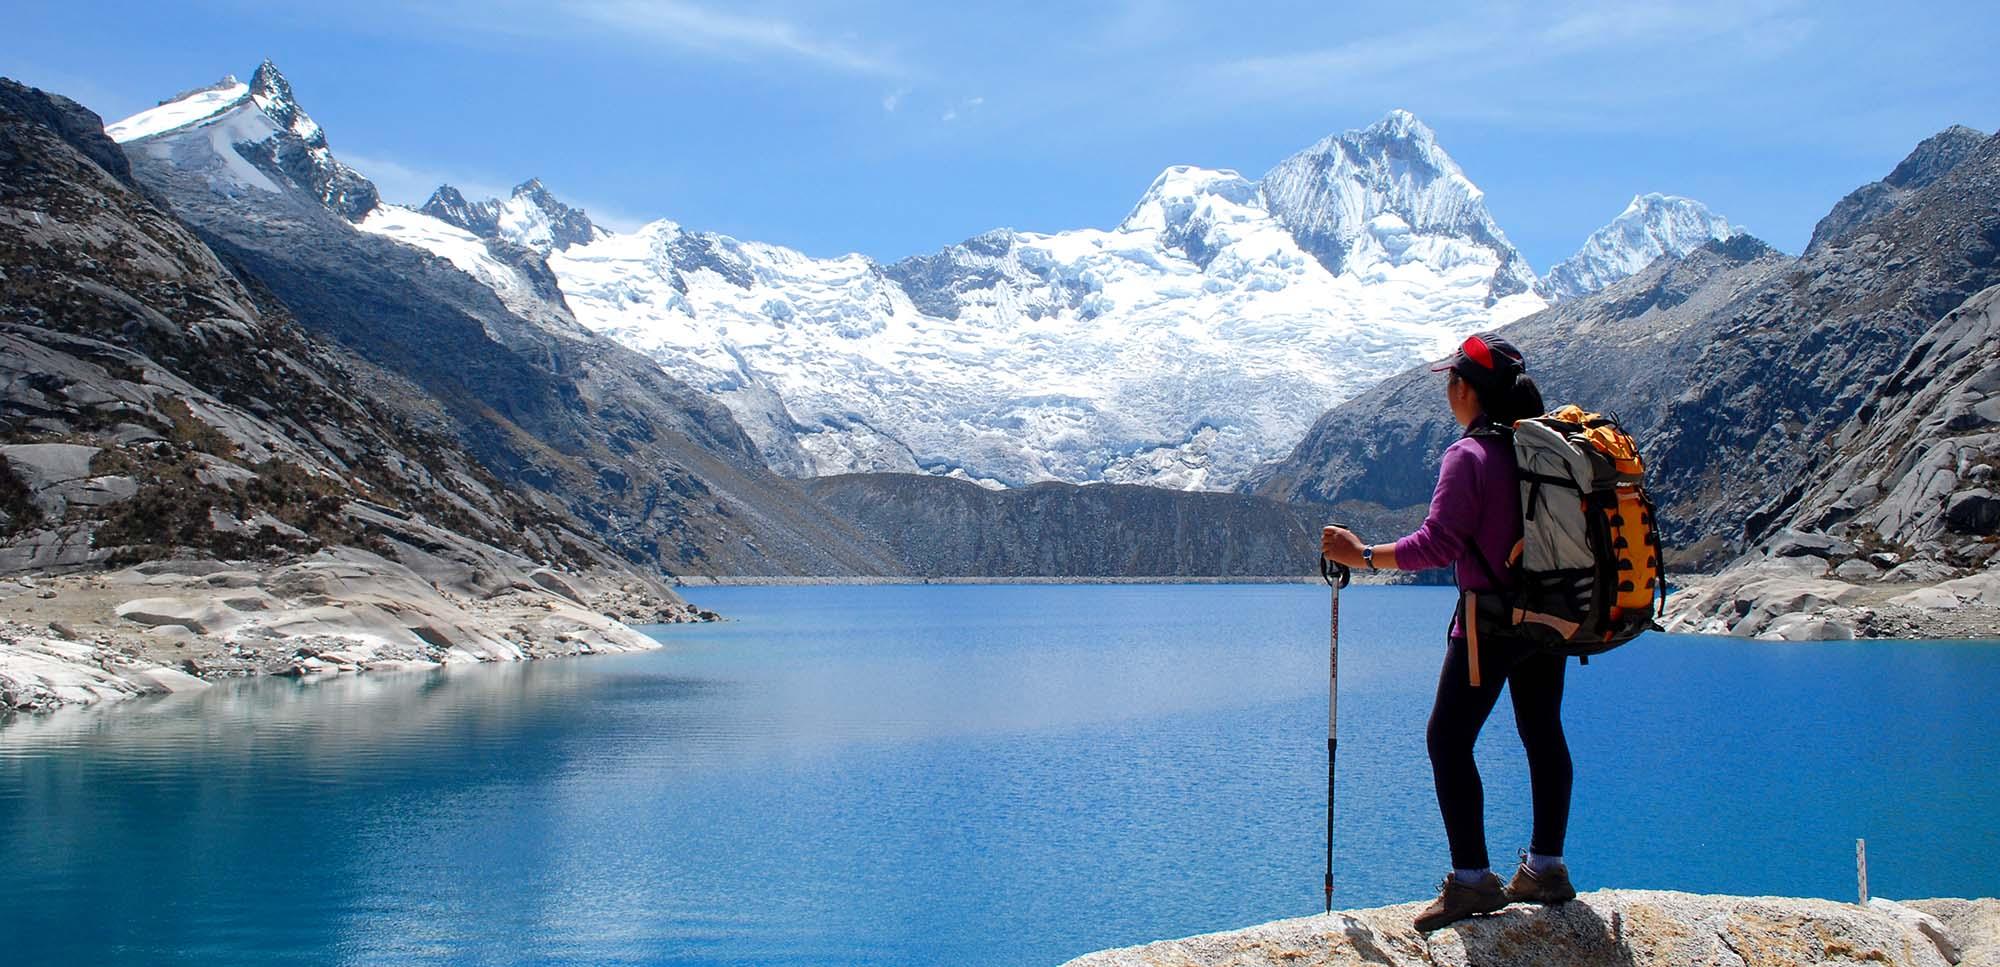 Peru, treks, climbs, hiking, - Cullicocha Lake (4500m) – Alpamayo Circuit Trek